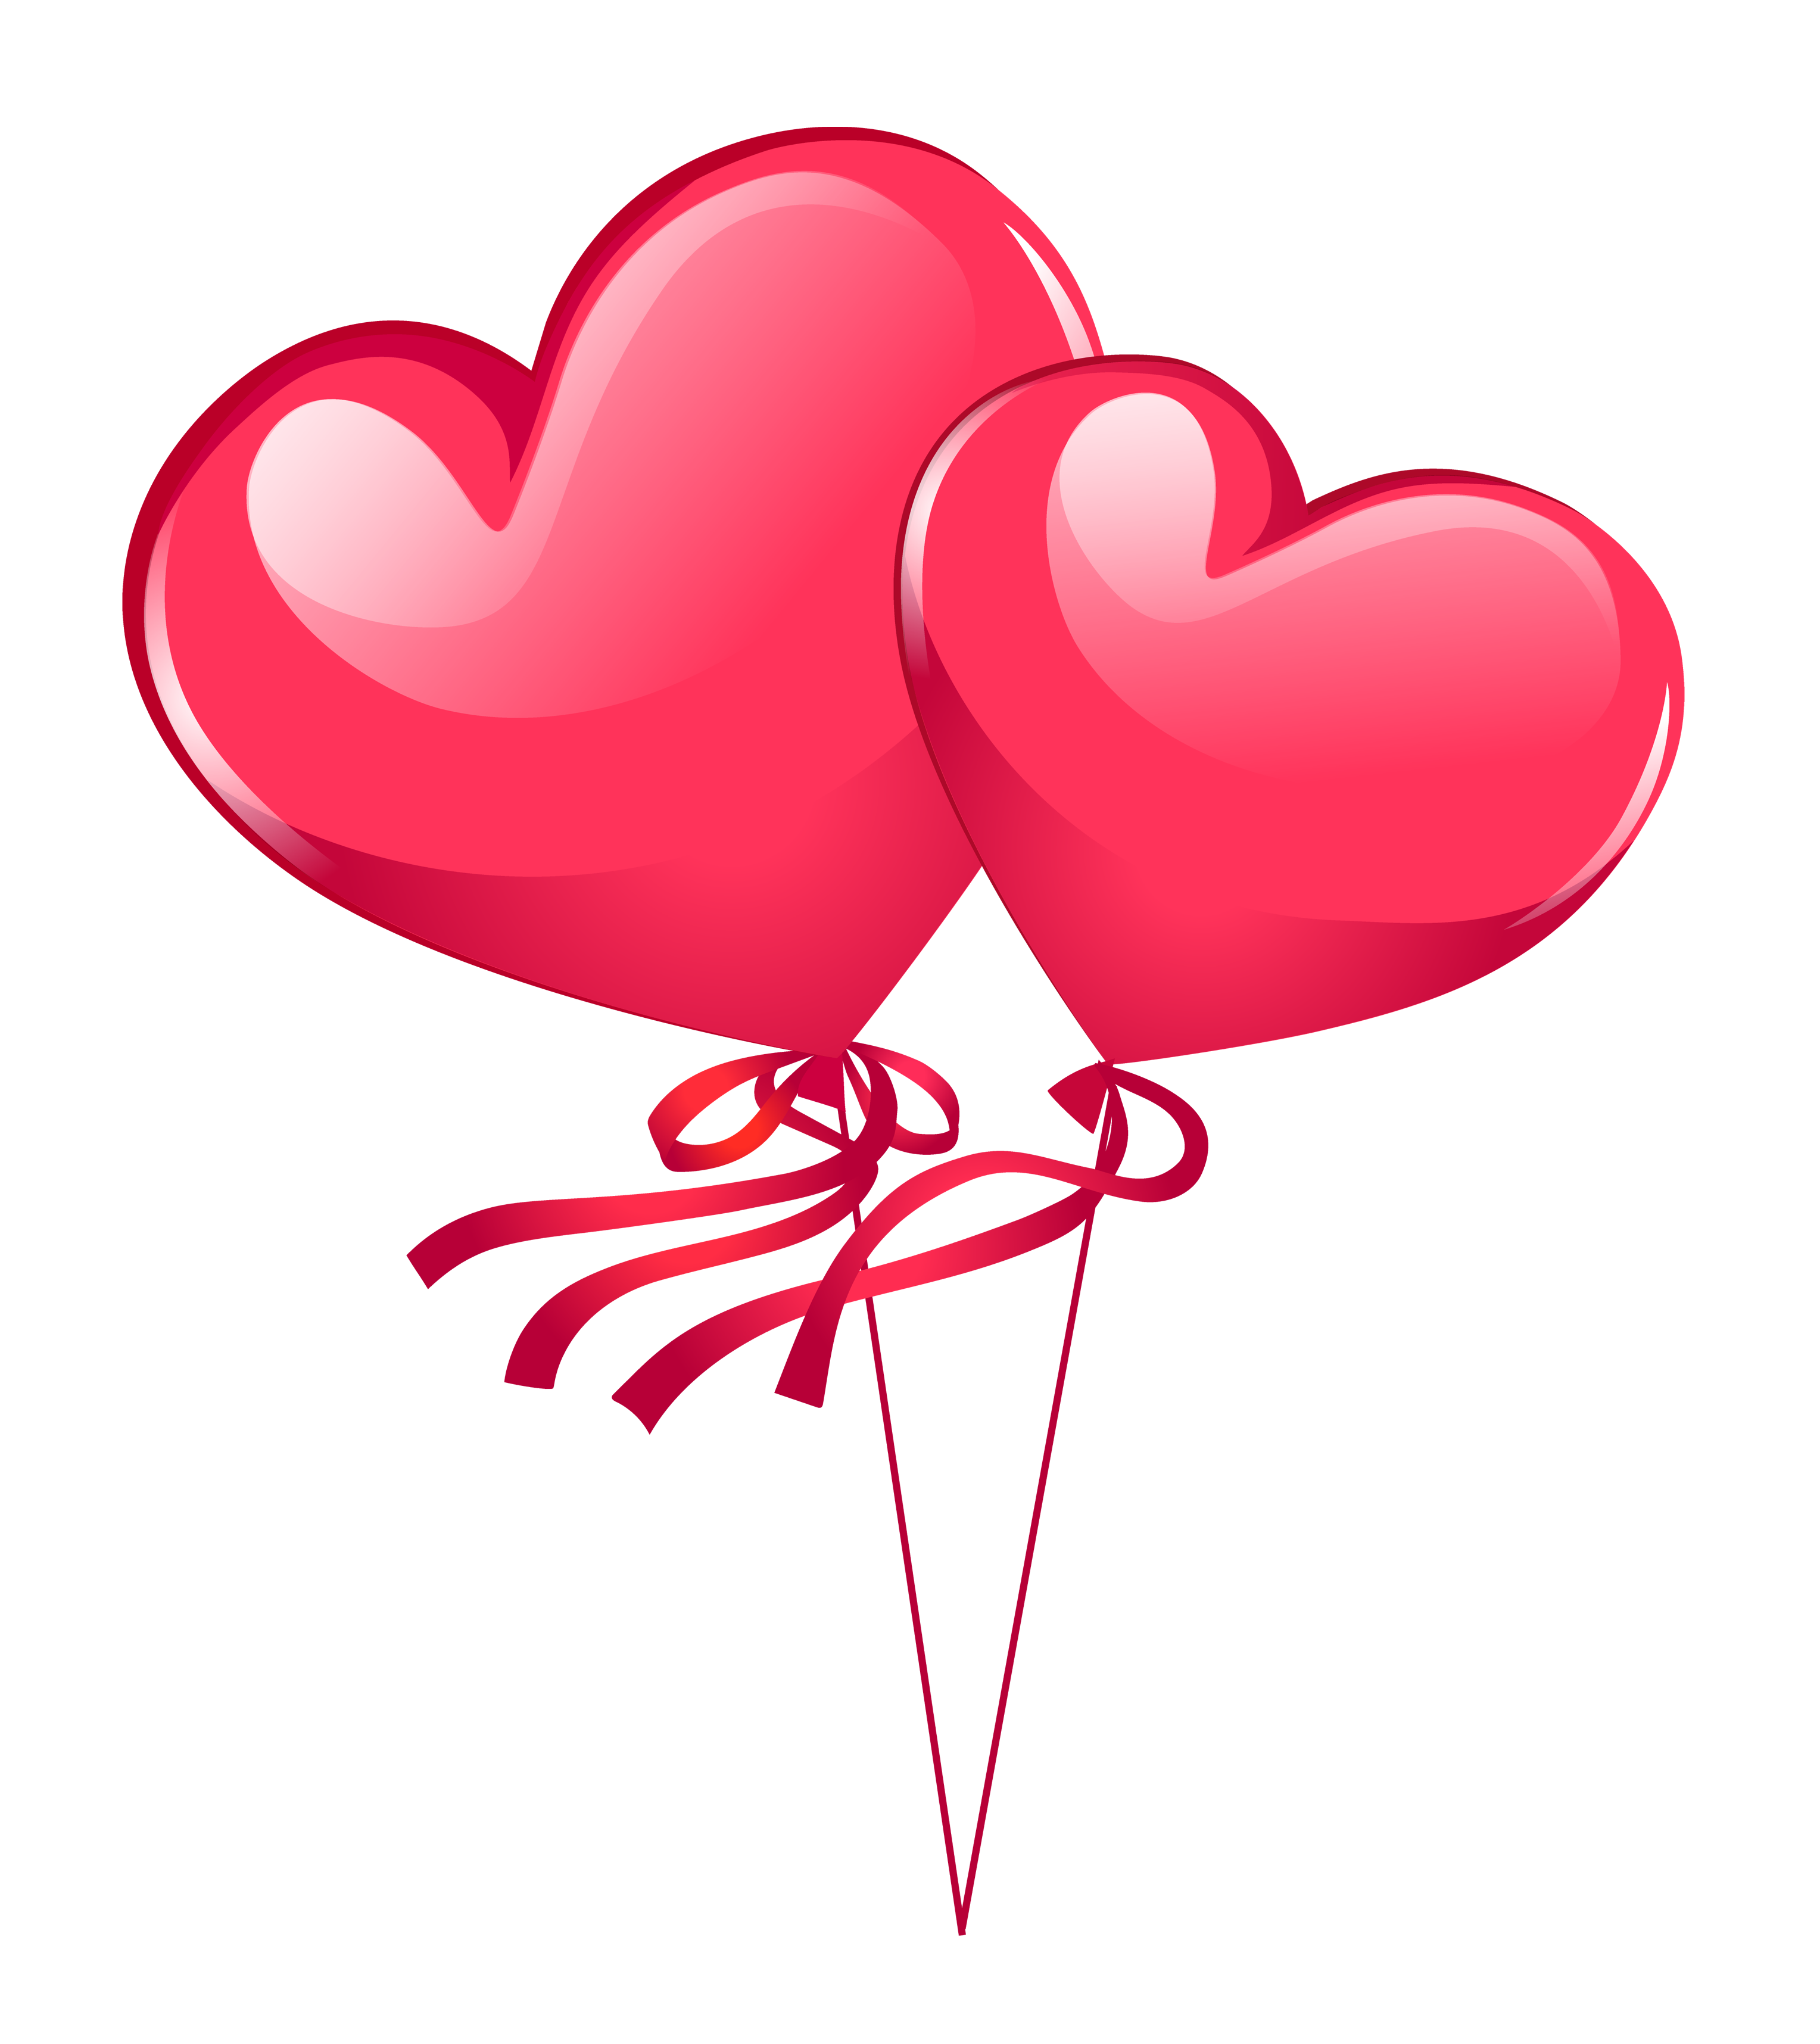 Balloons png image pngpix. Heart clipart bouquet